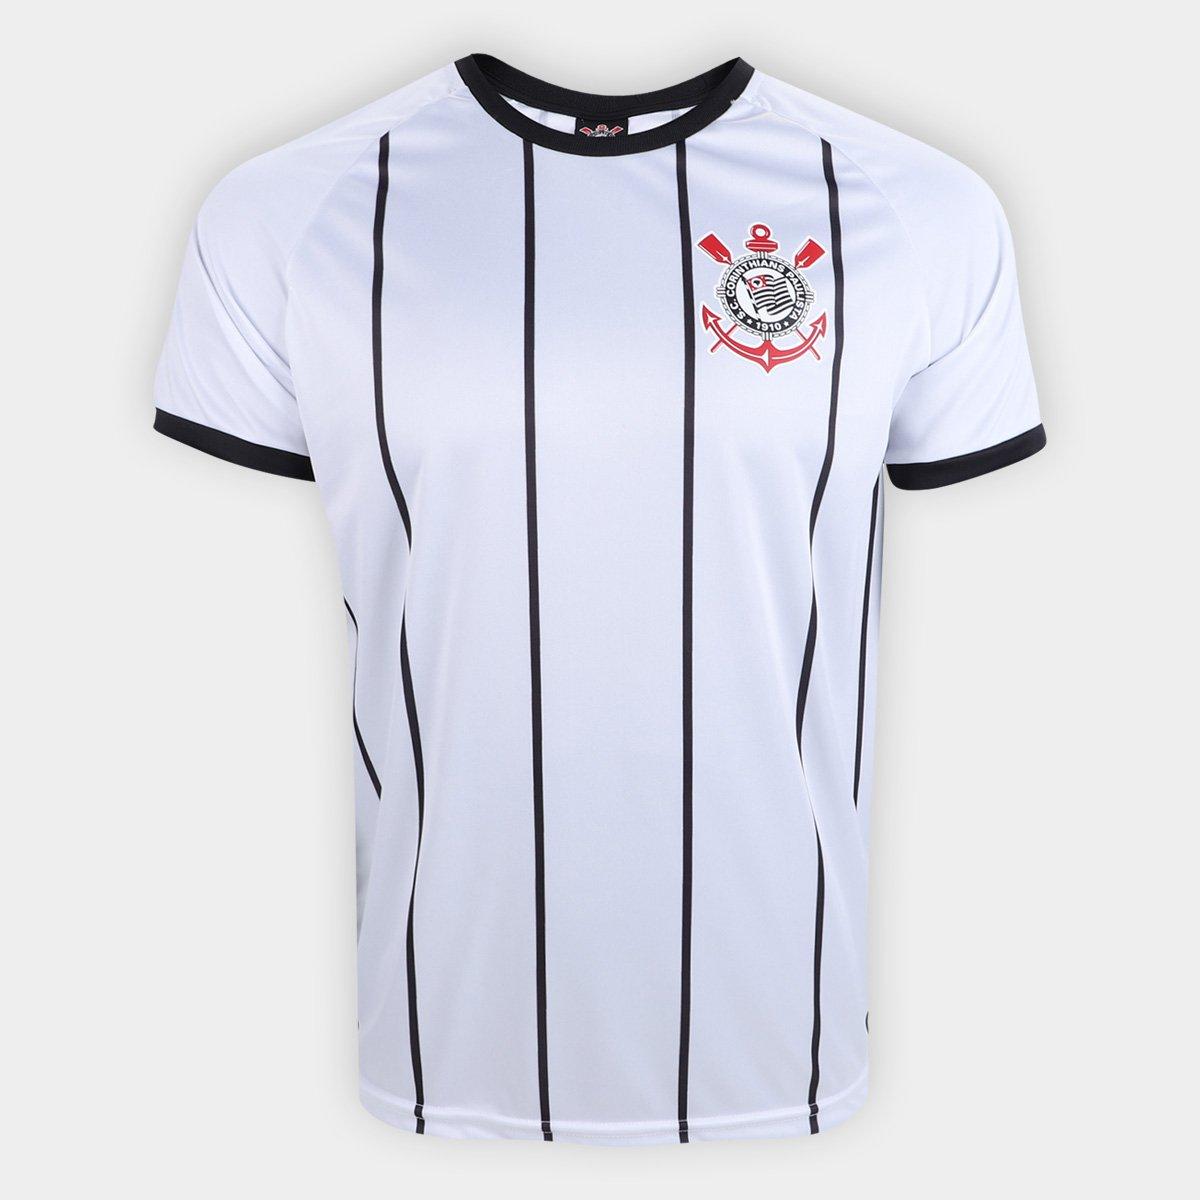 aab02eac2d Camisa Corinthians Fenomenal - Edição Limitada Torcedor Masculina ...